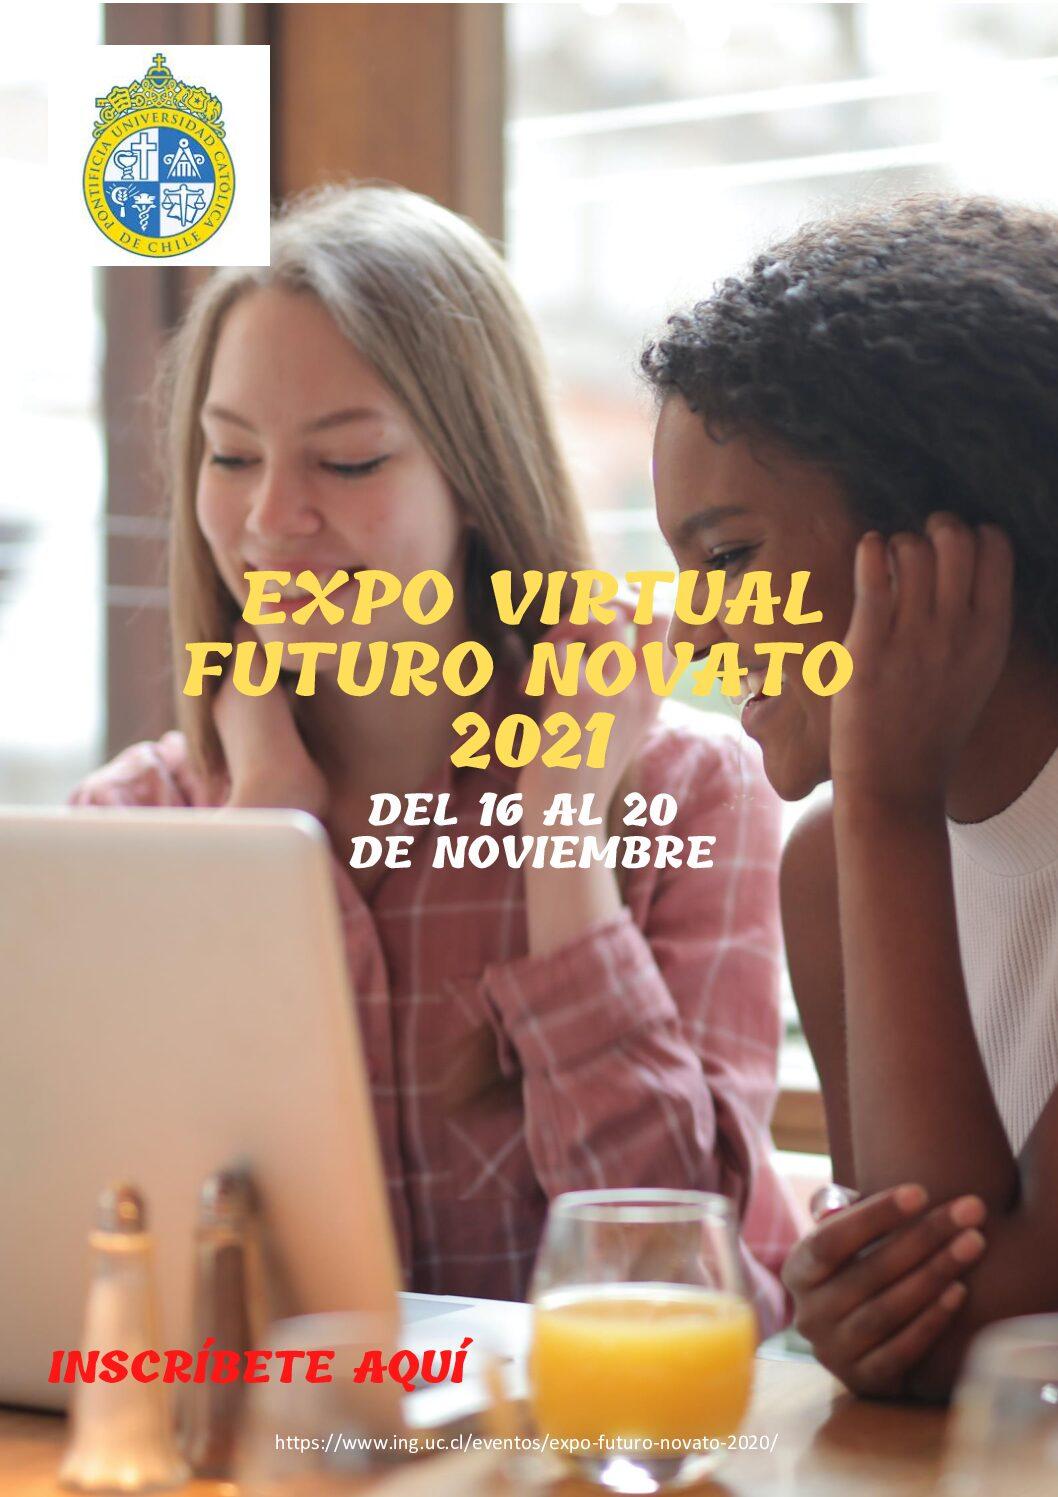 Expo Virtual Futuro Novato 2021